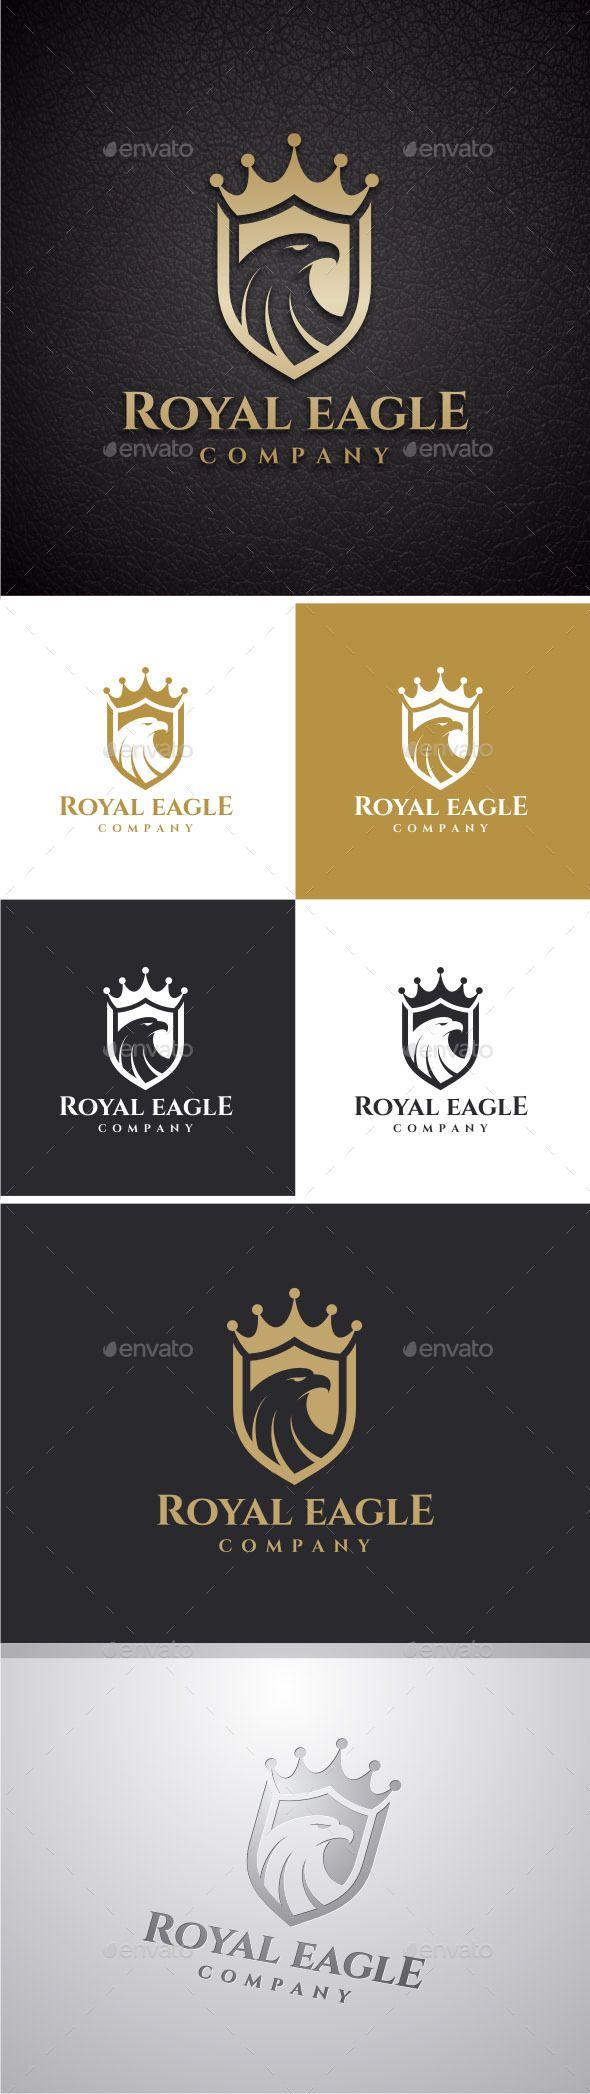 Royal Eagle Logo Template #design #logotype Download: http://graphicriver.net/item/royal-eagle-logo/8567477?ref=ksioks